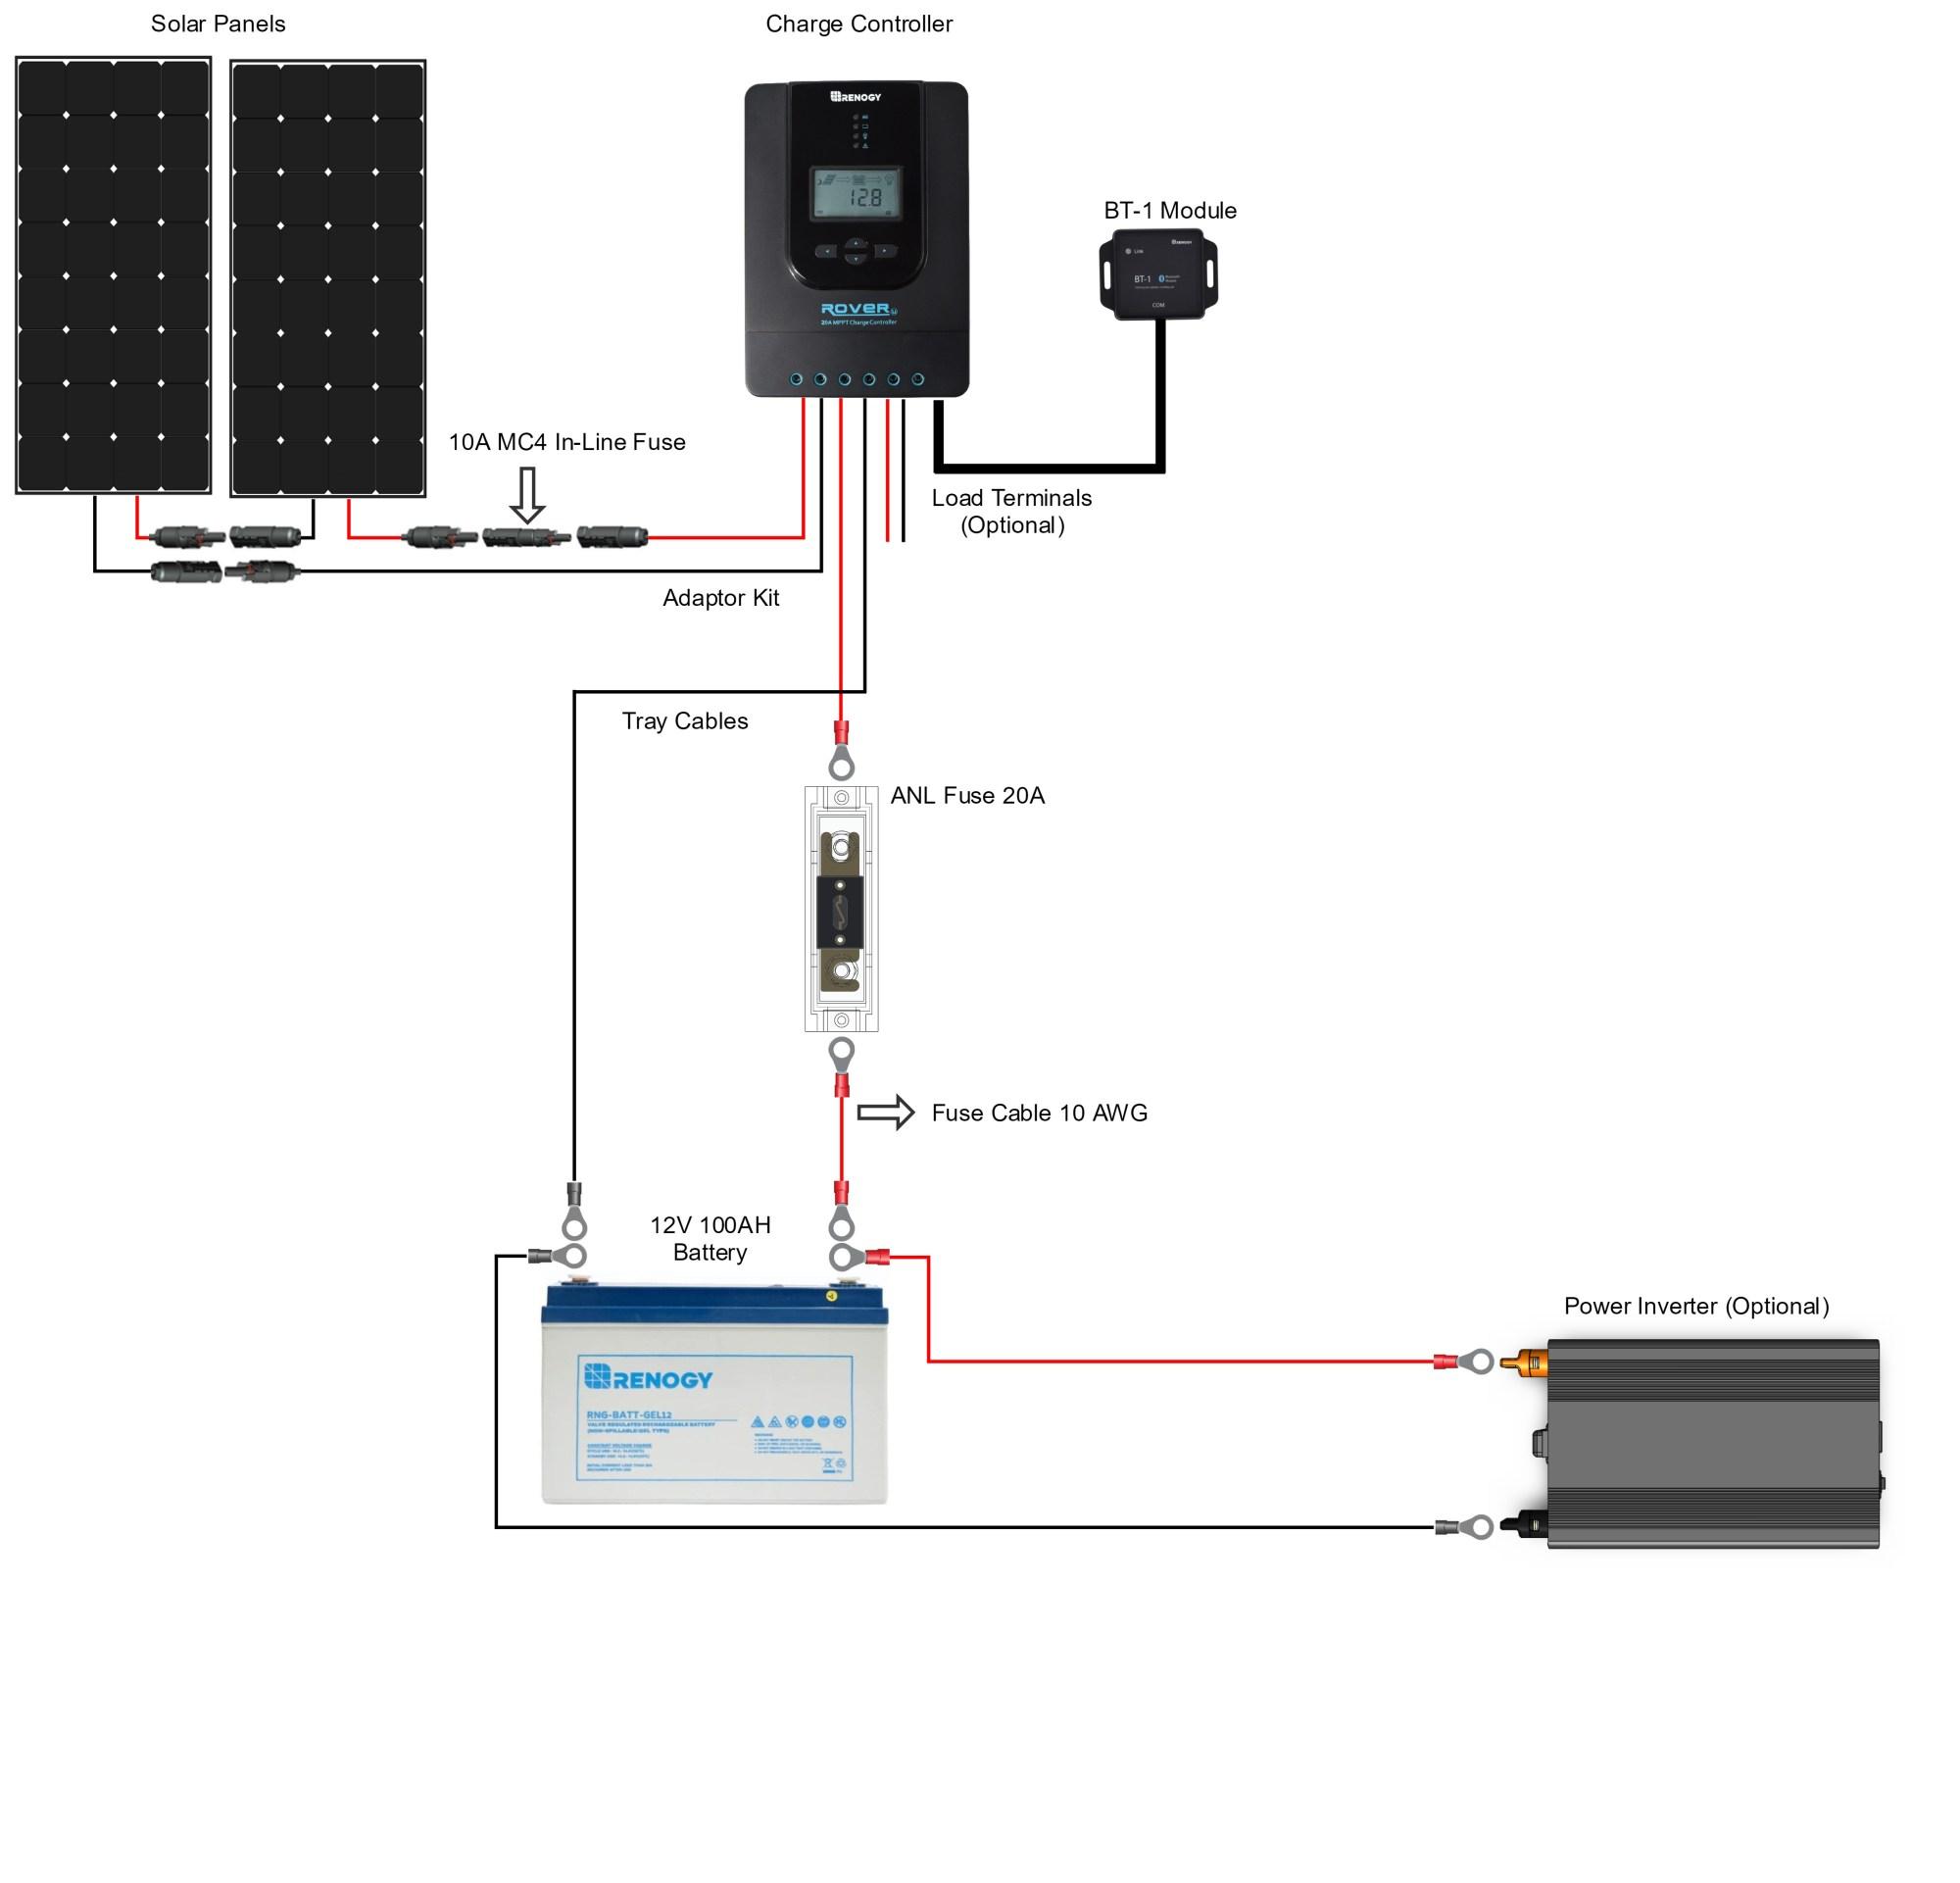 hight resolution of renogy wiring diagram wiring diagram centre renogy solar panel wiring diagram 200 watt 12 volt eclipse